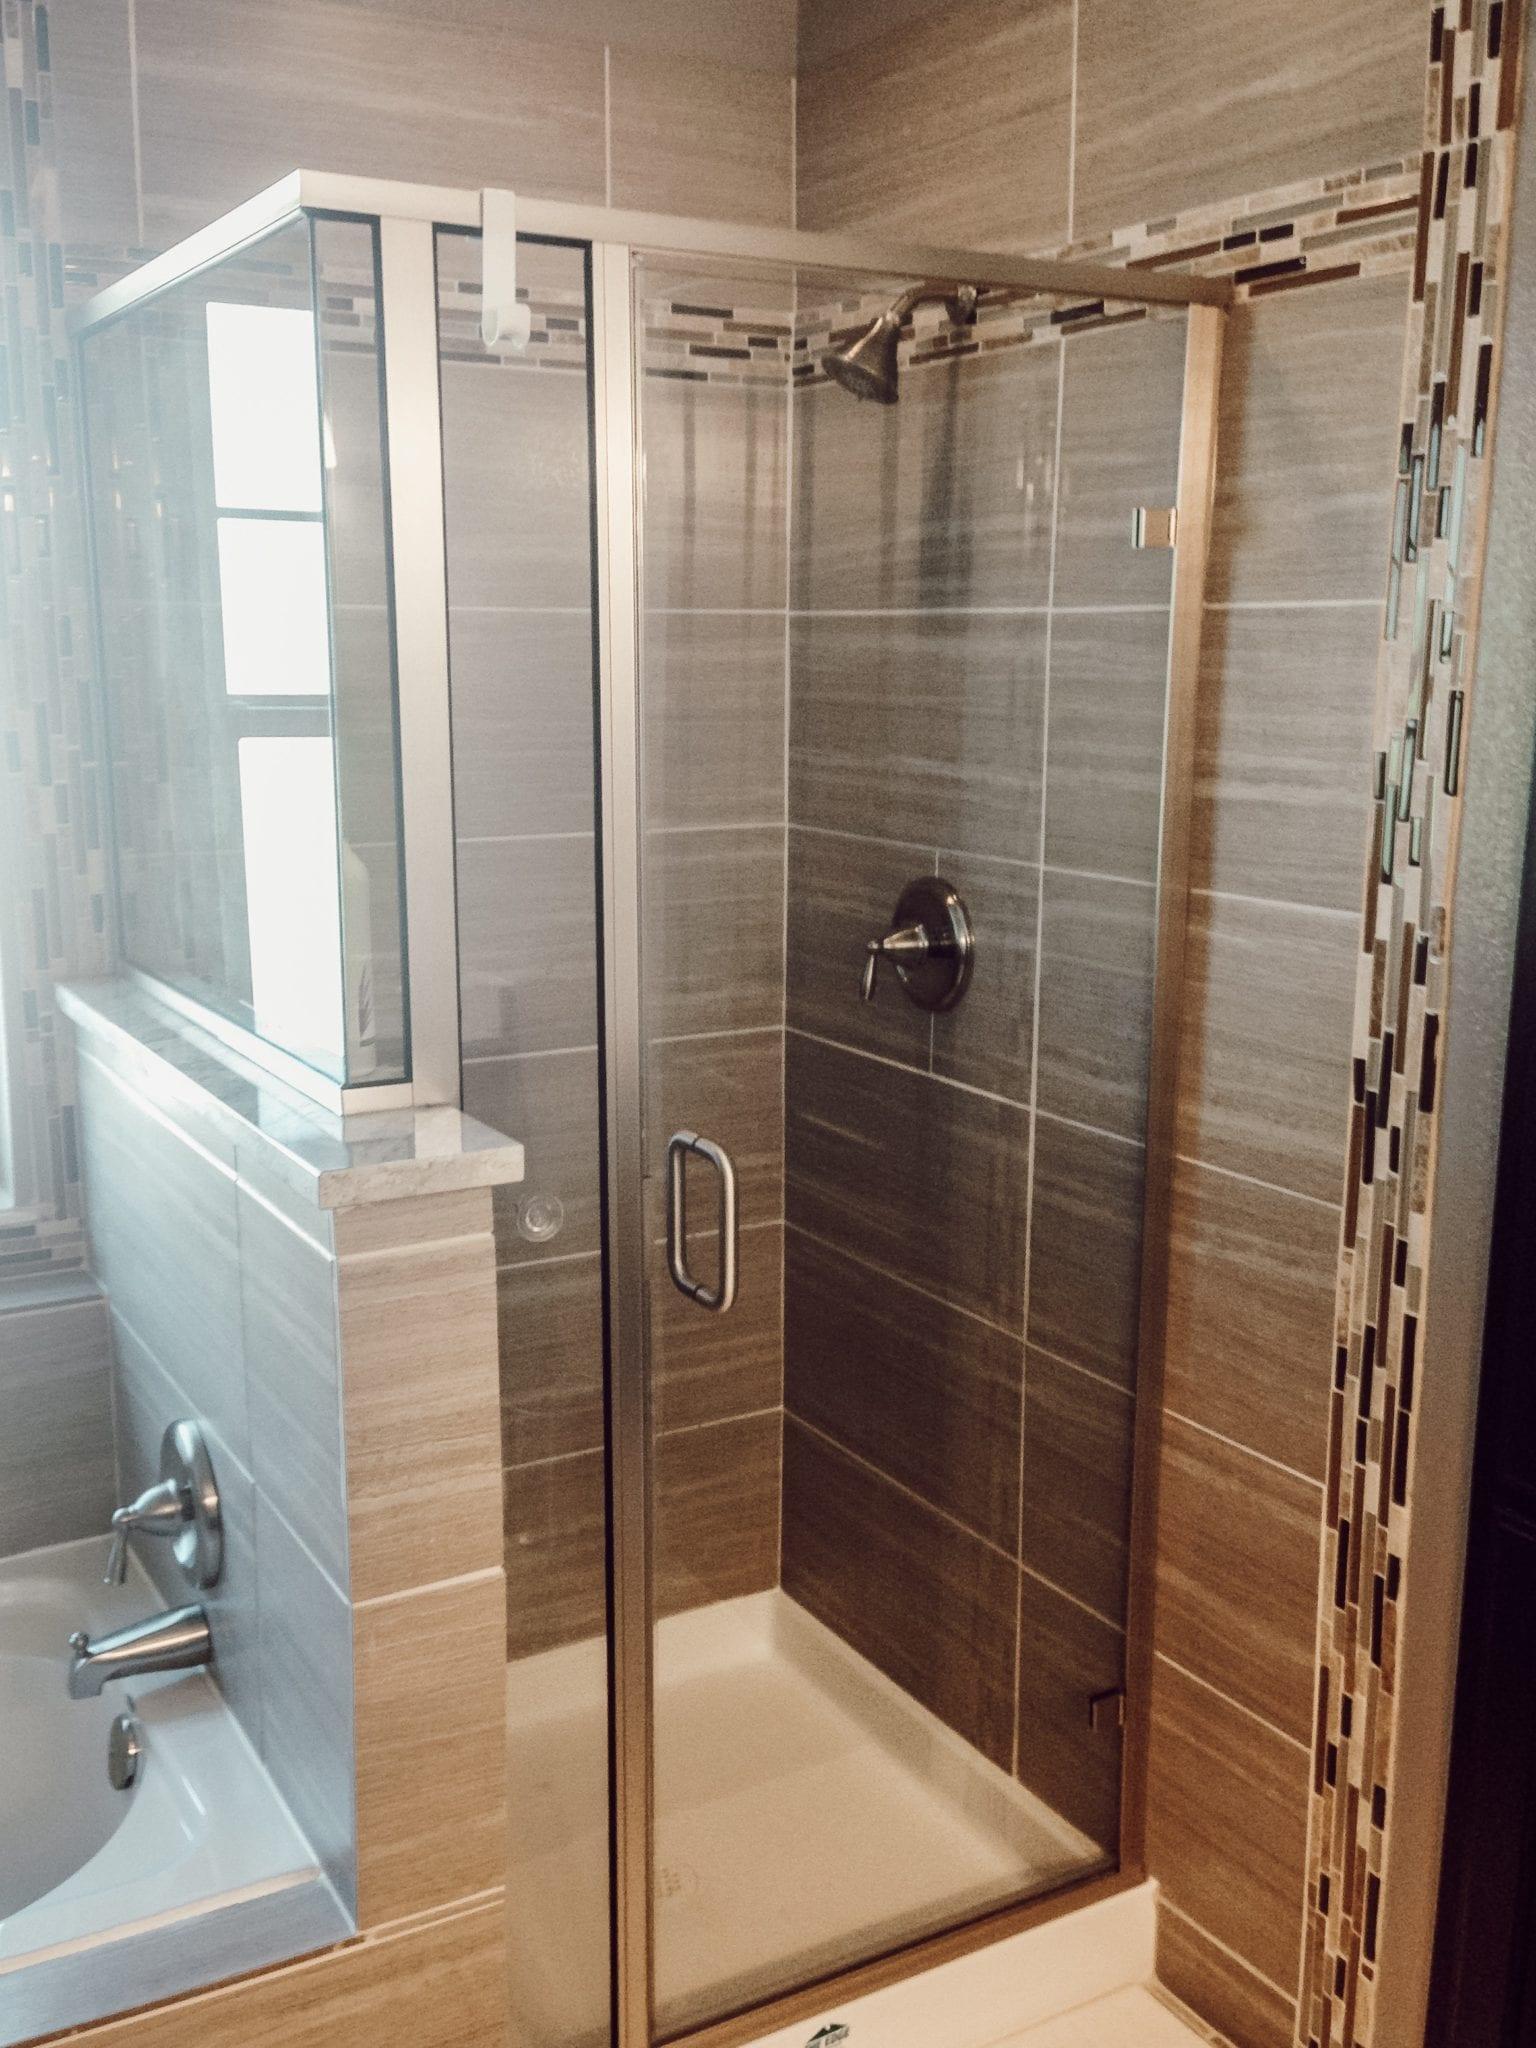 caddo mills shower remodel